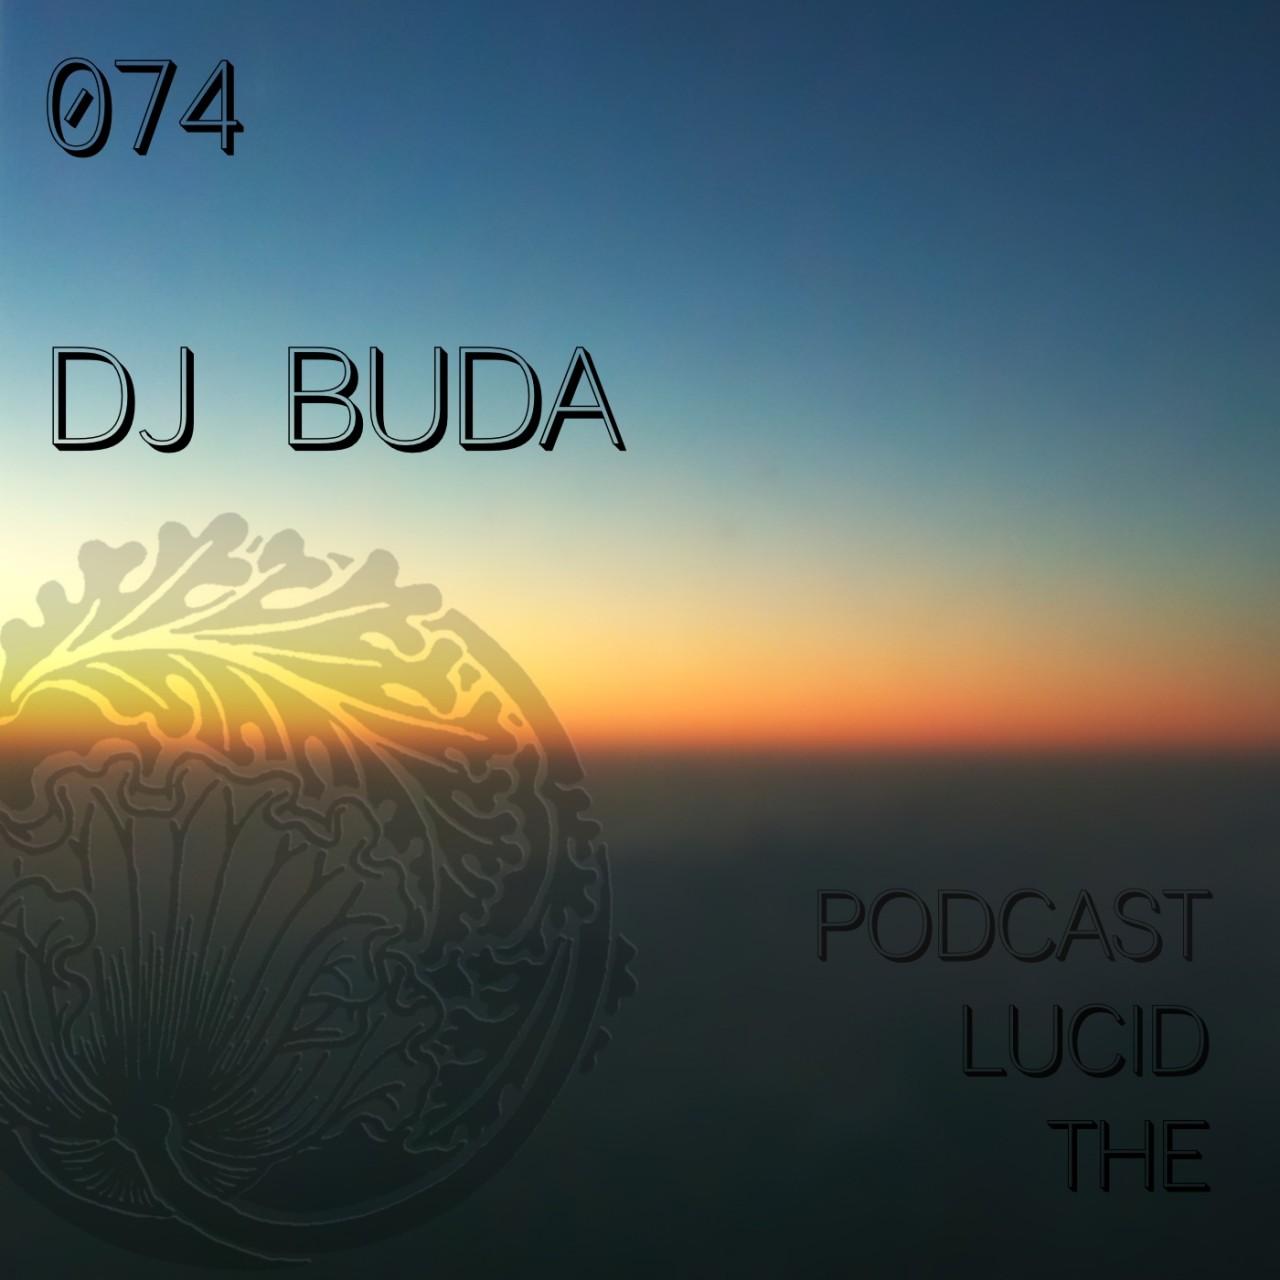 The Lucid Podcast 074 DJ Buda (Lulu Rouge)